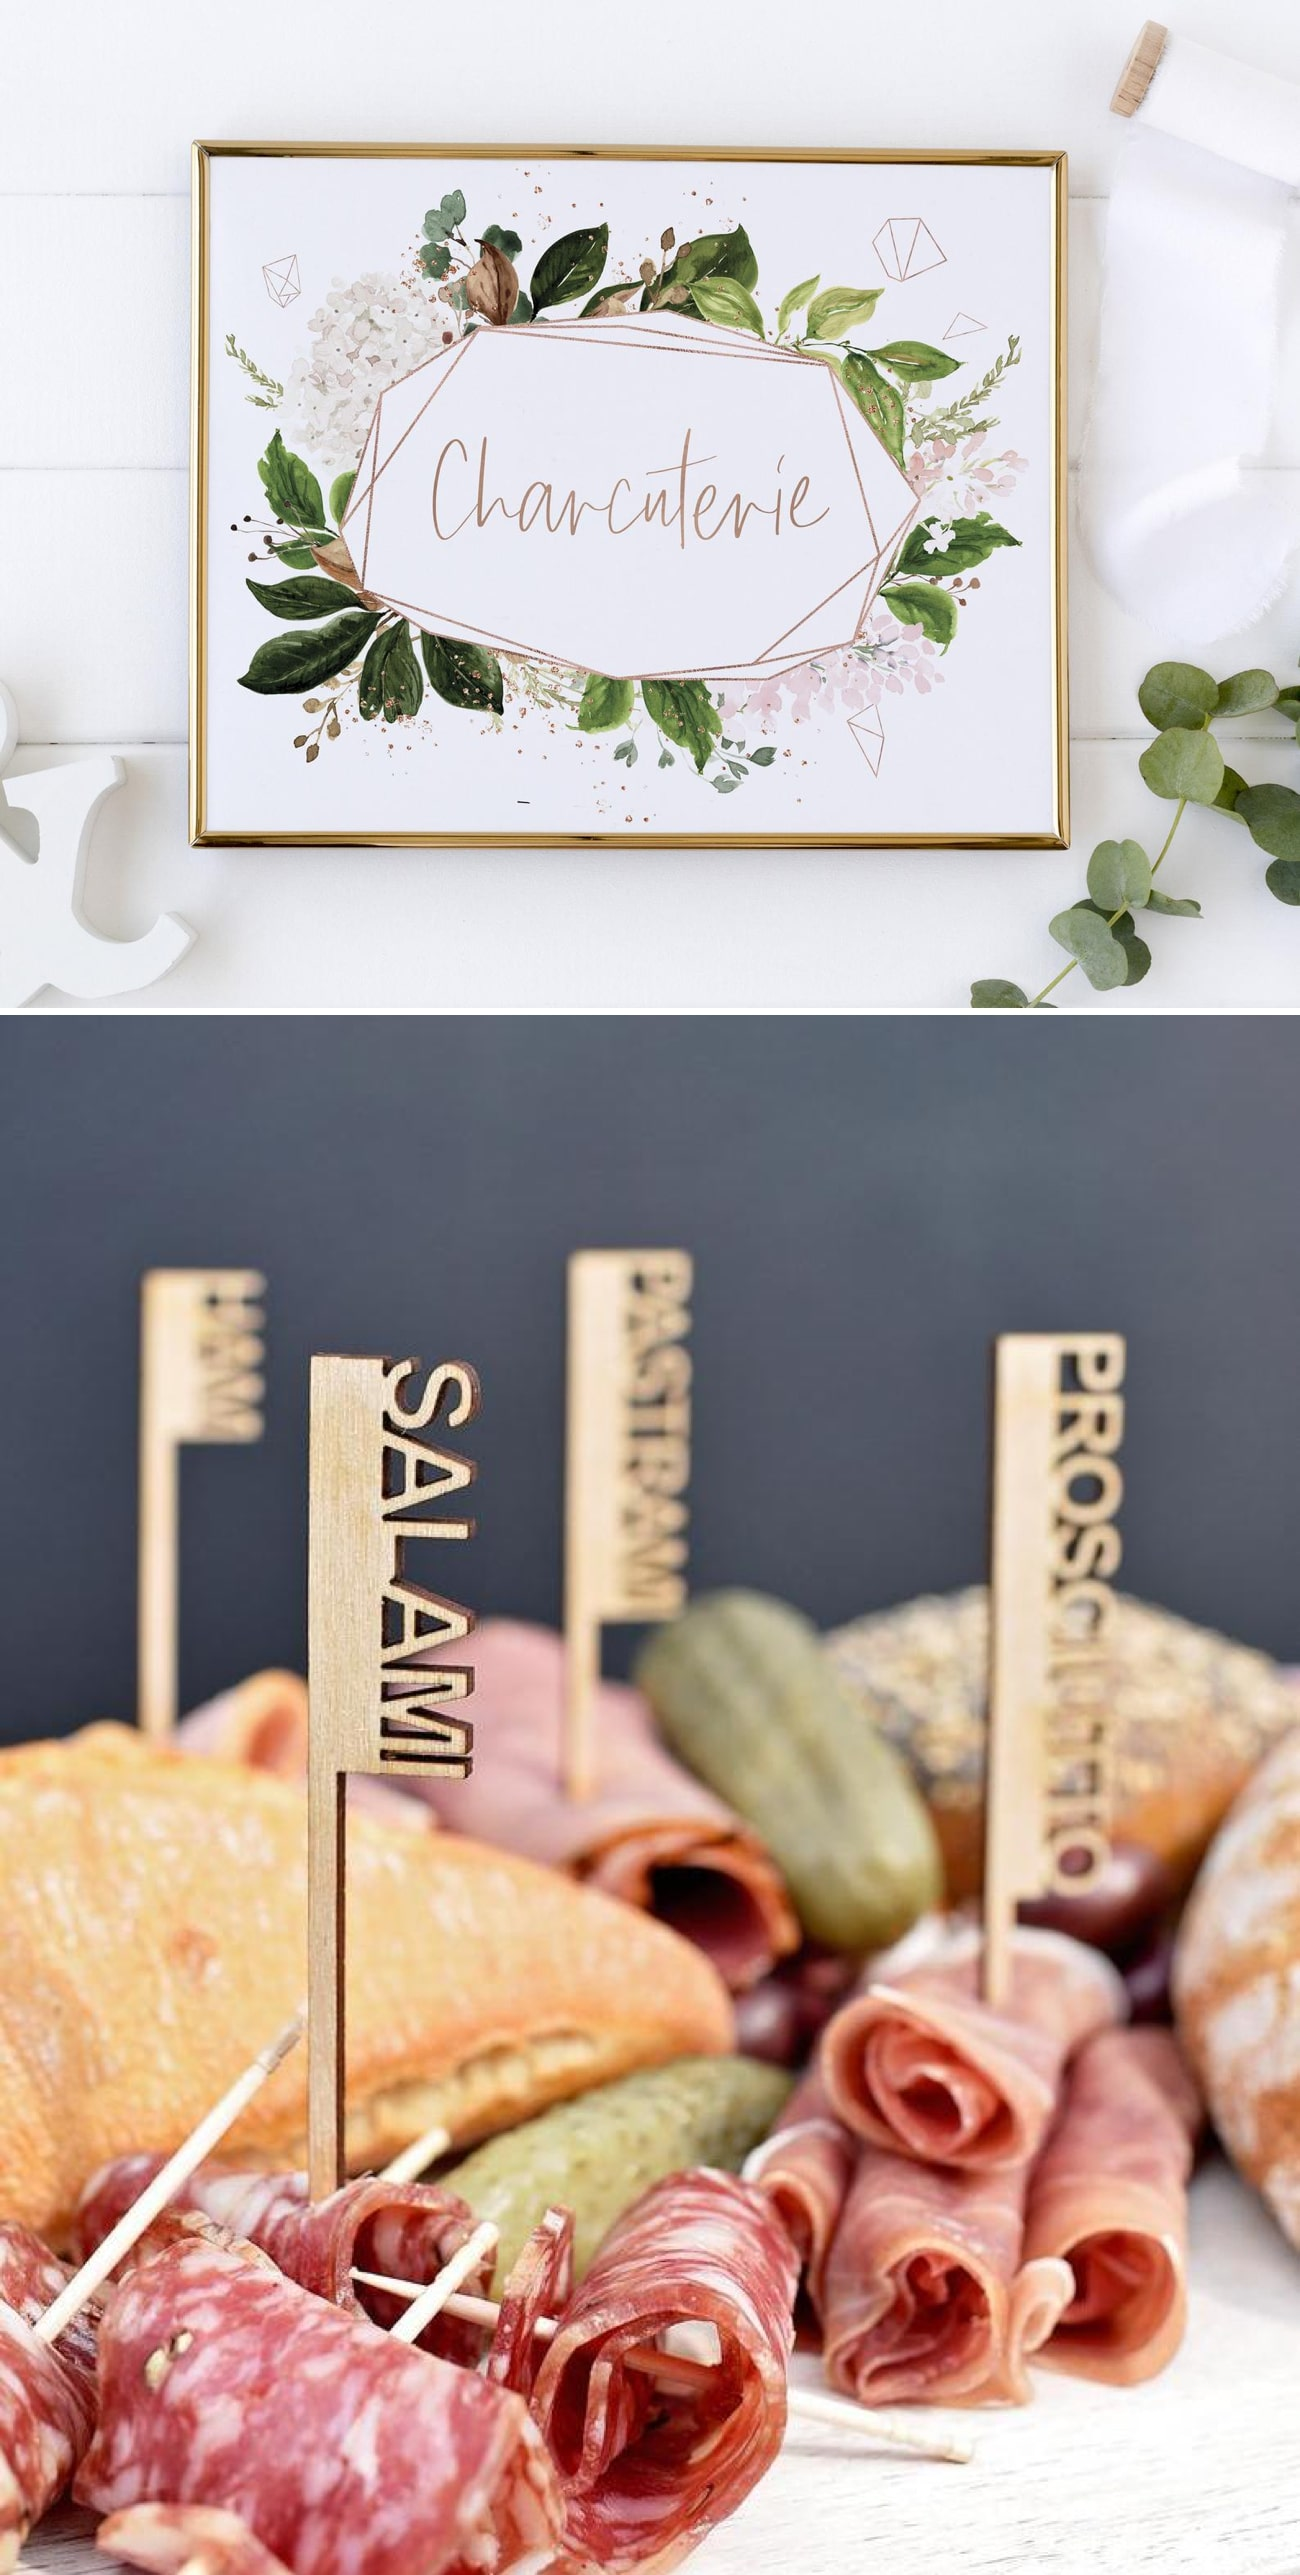 Dessert-Table-Alternatives-Charcuterie-Station-Signage